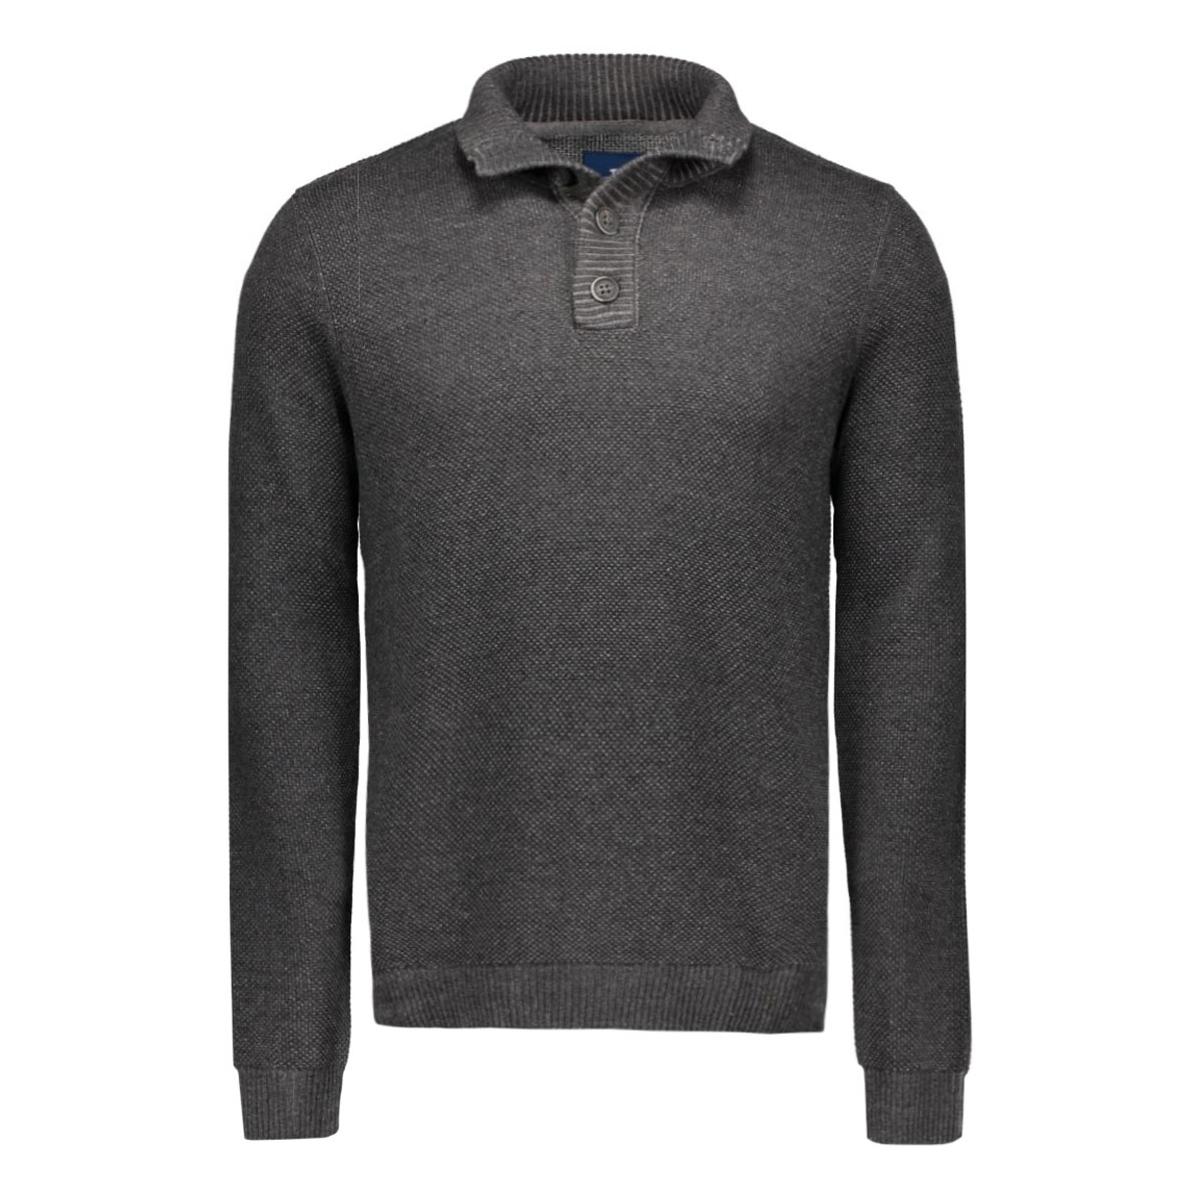 3021326.09.10 tom tailor sweater 2572